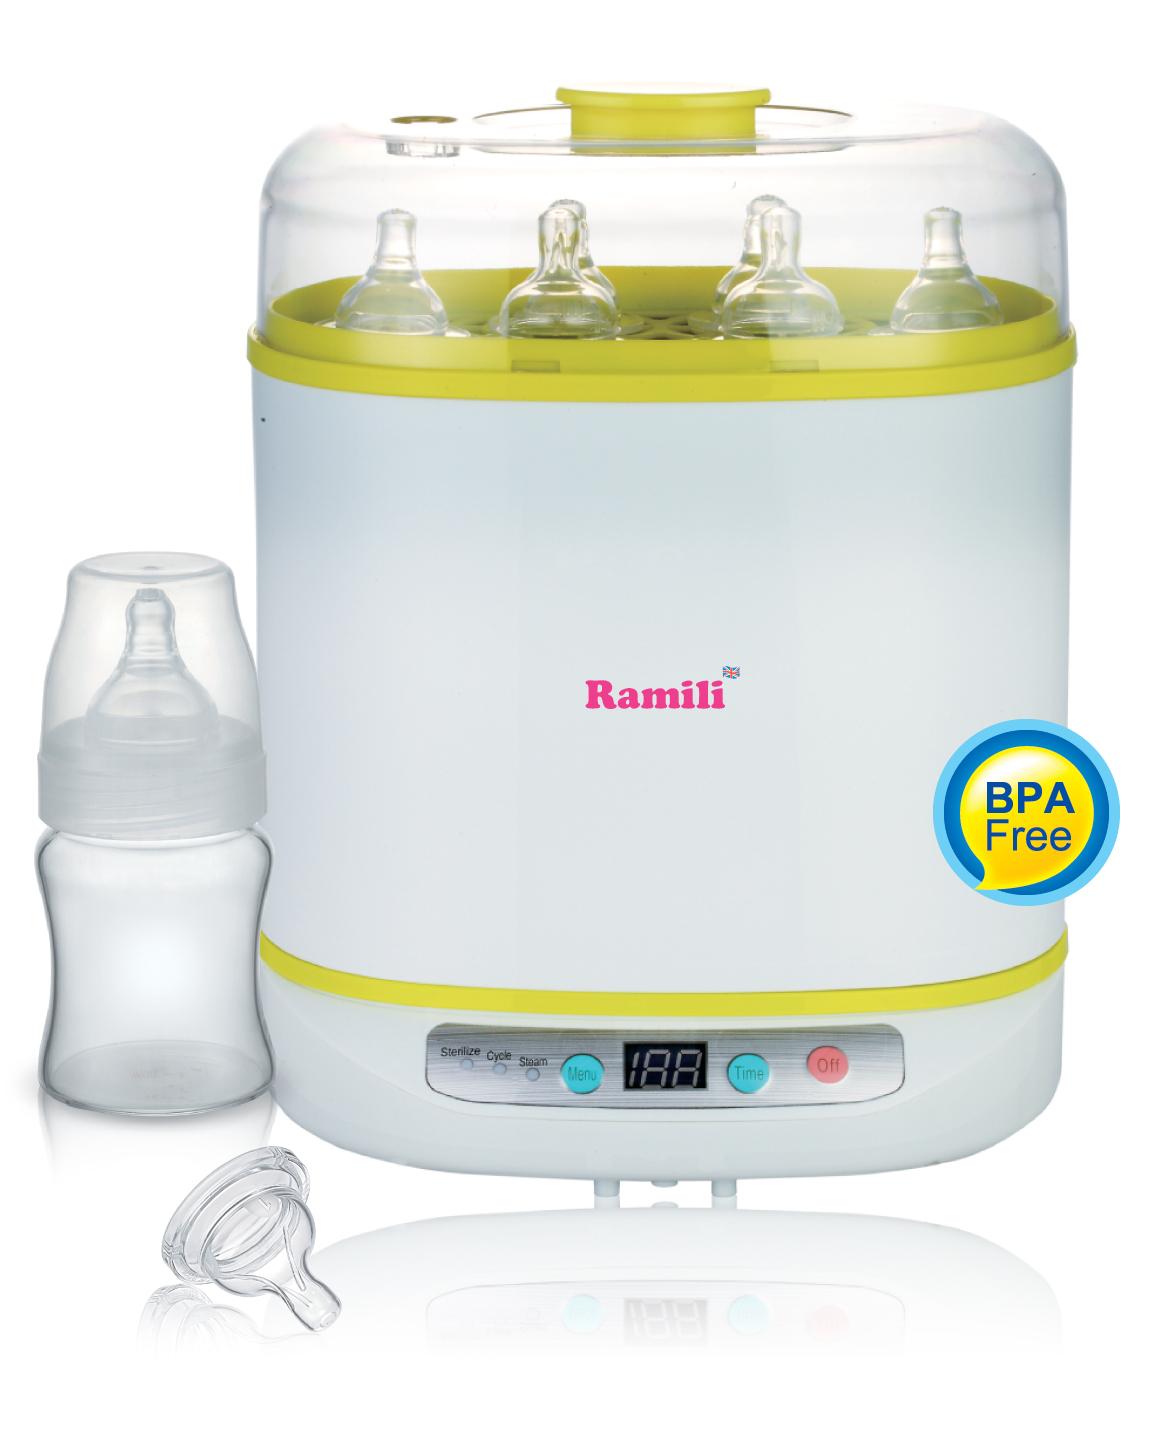 Ramili<sup>®</sup> Electric Steam Sterilizer BSS150